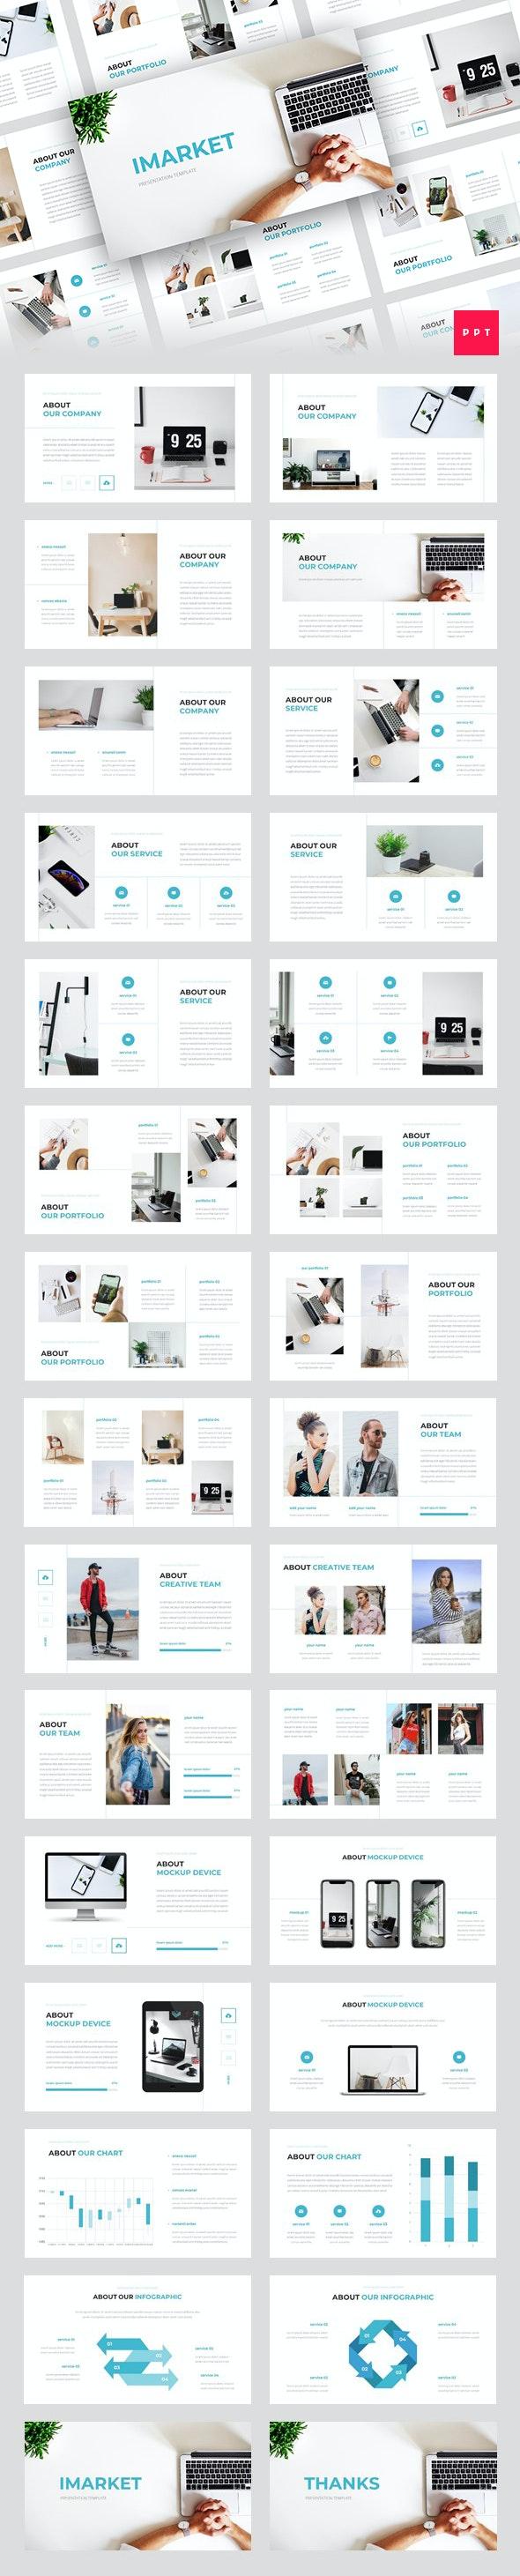 Imarket - Internet Marketing PowerPoint Template - Business PowerPoint Templates